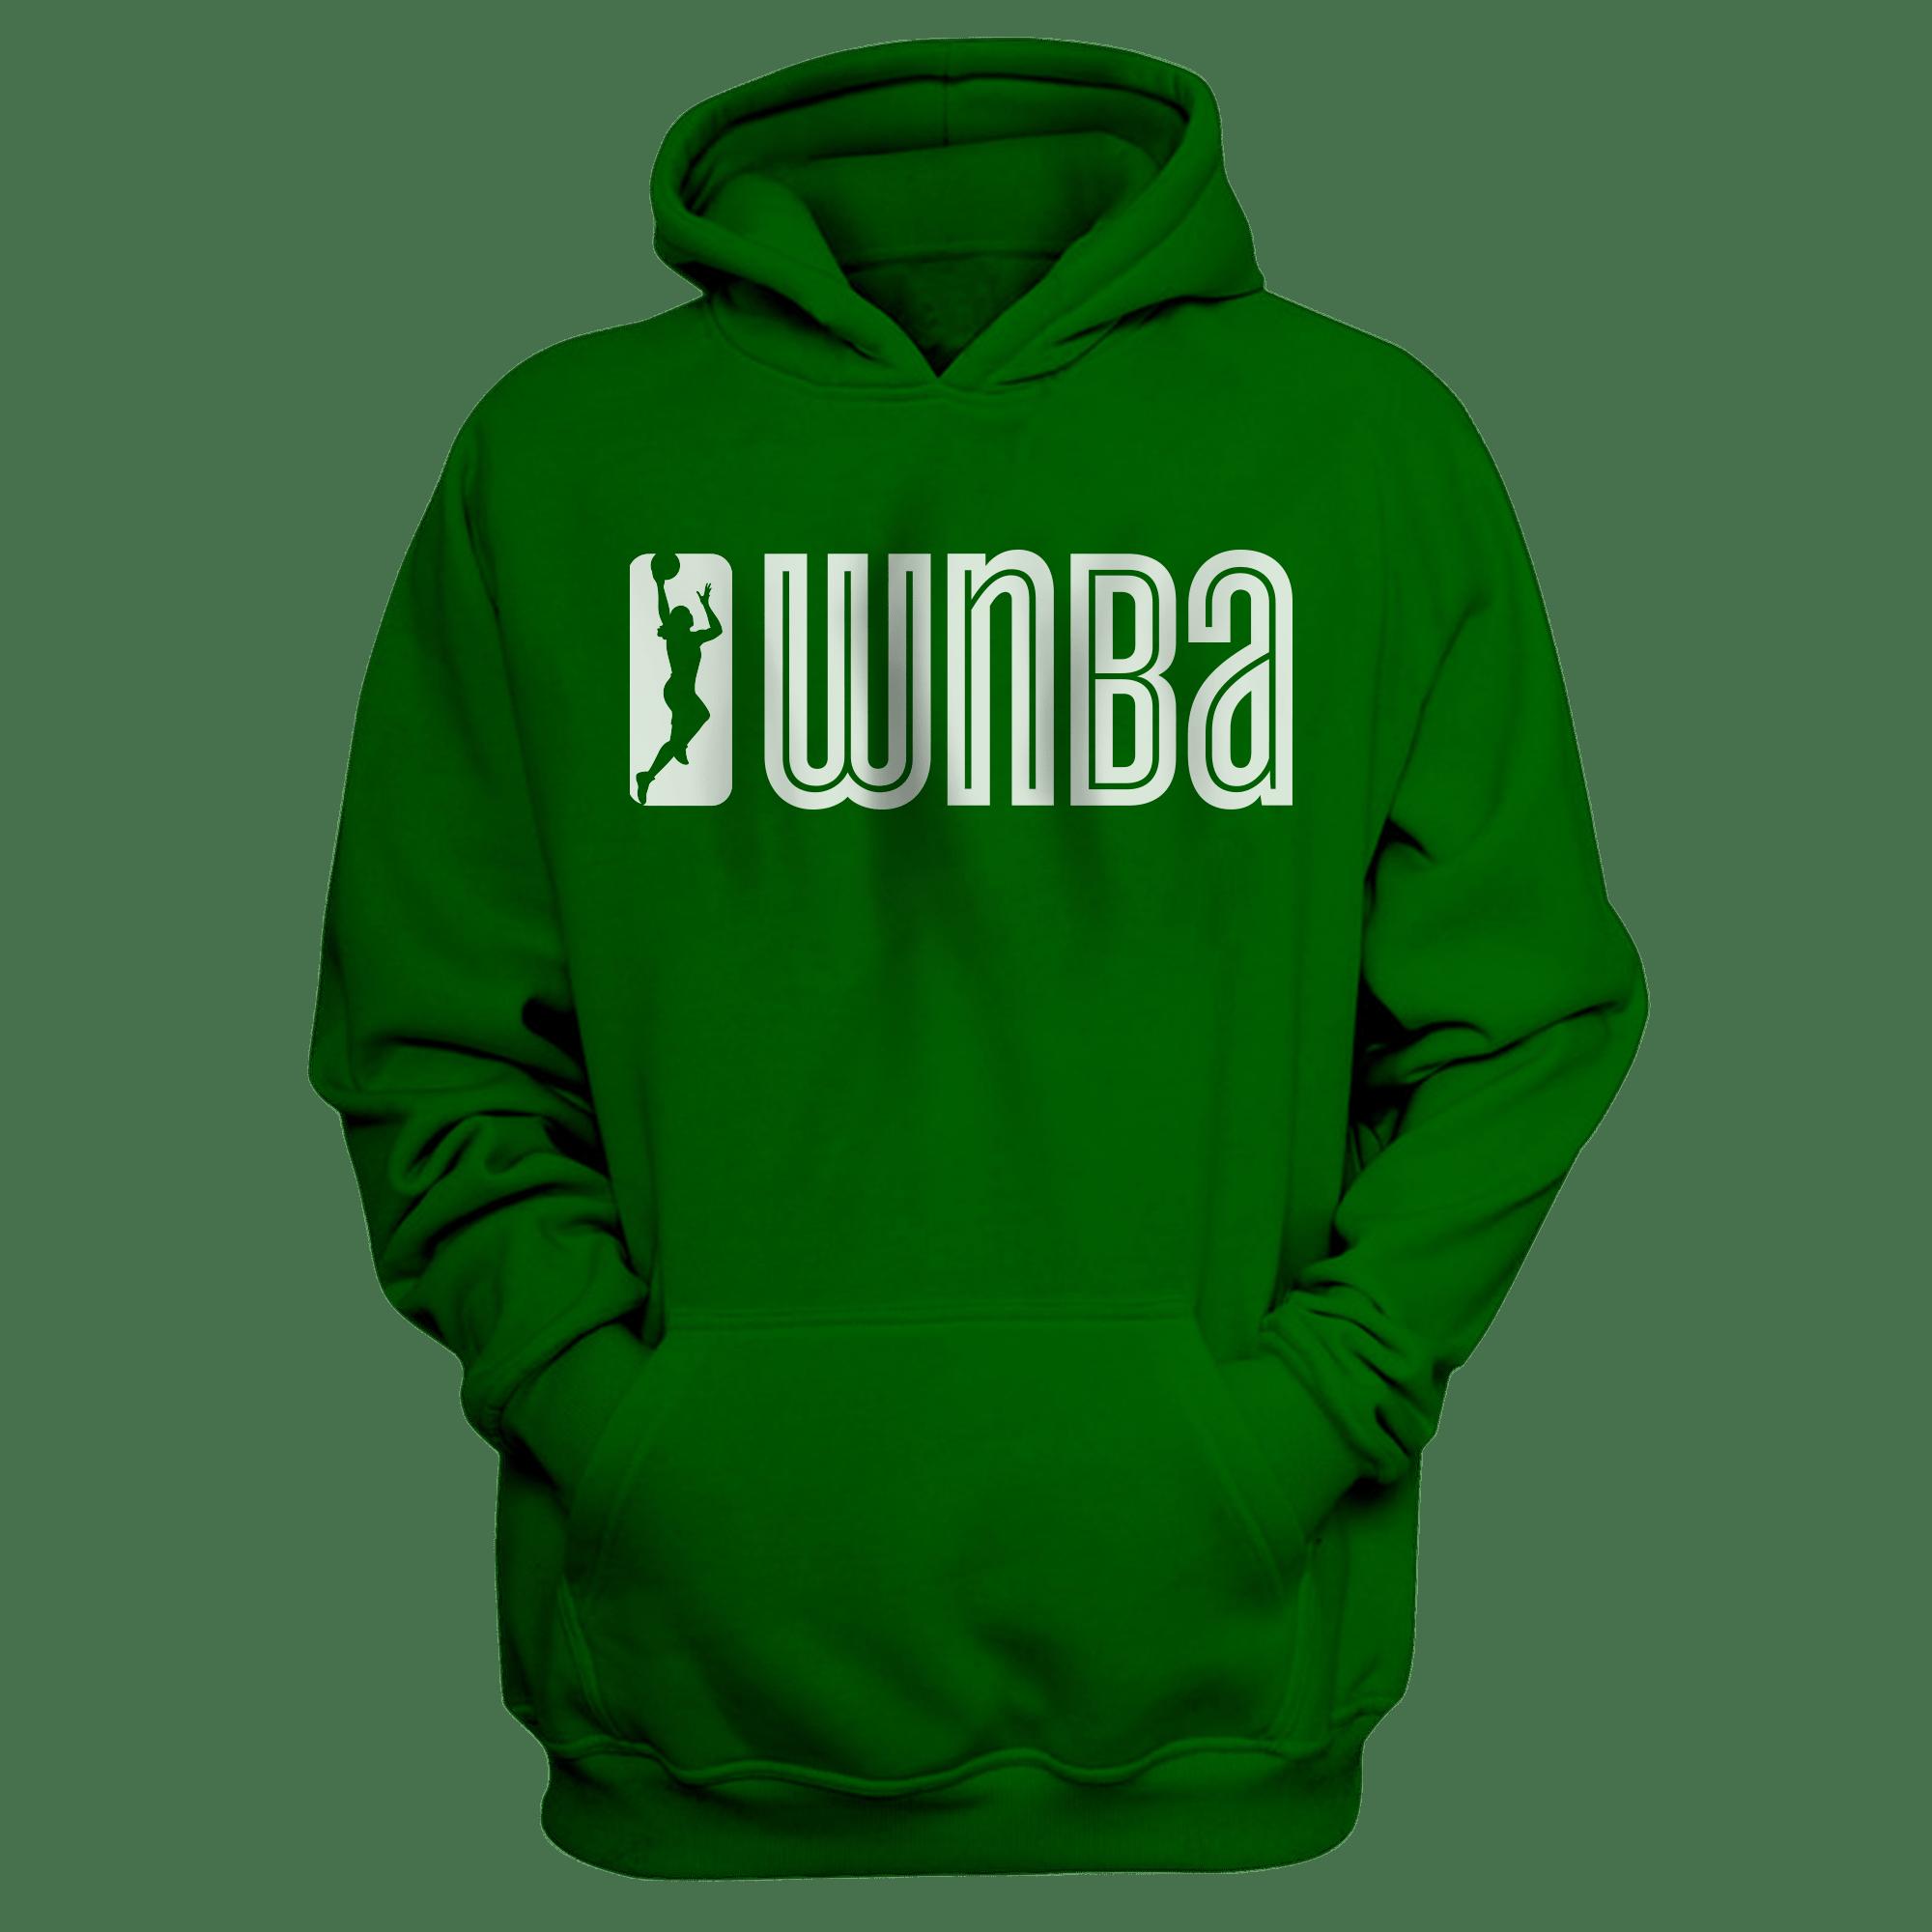 WNBA Hoodie (HD-GRN-NP-WNBA-633)